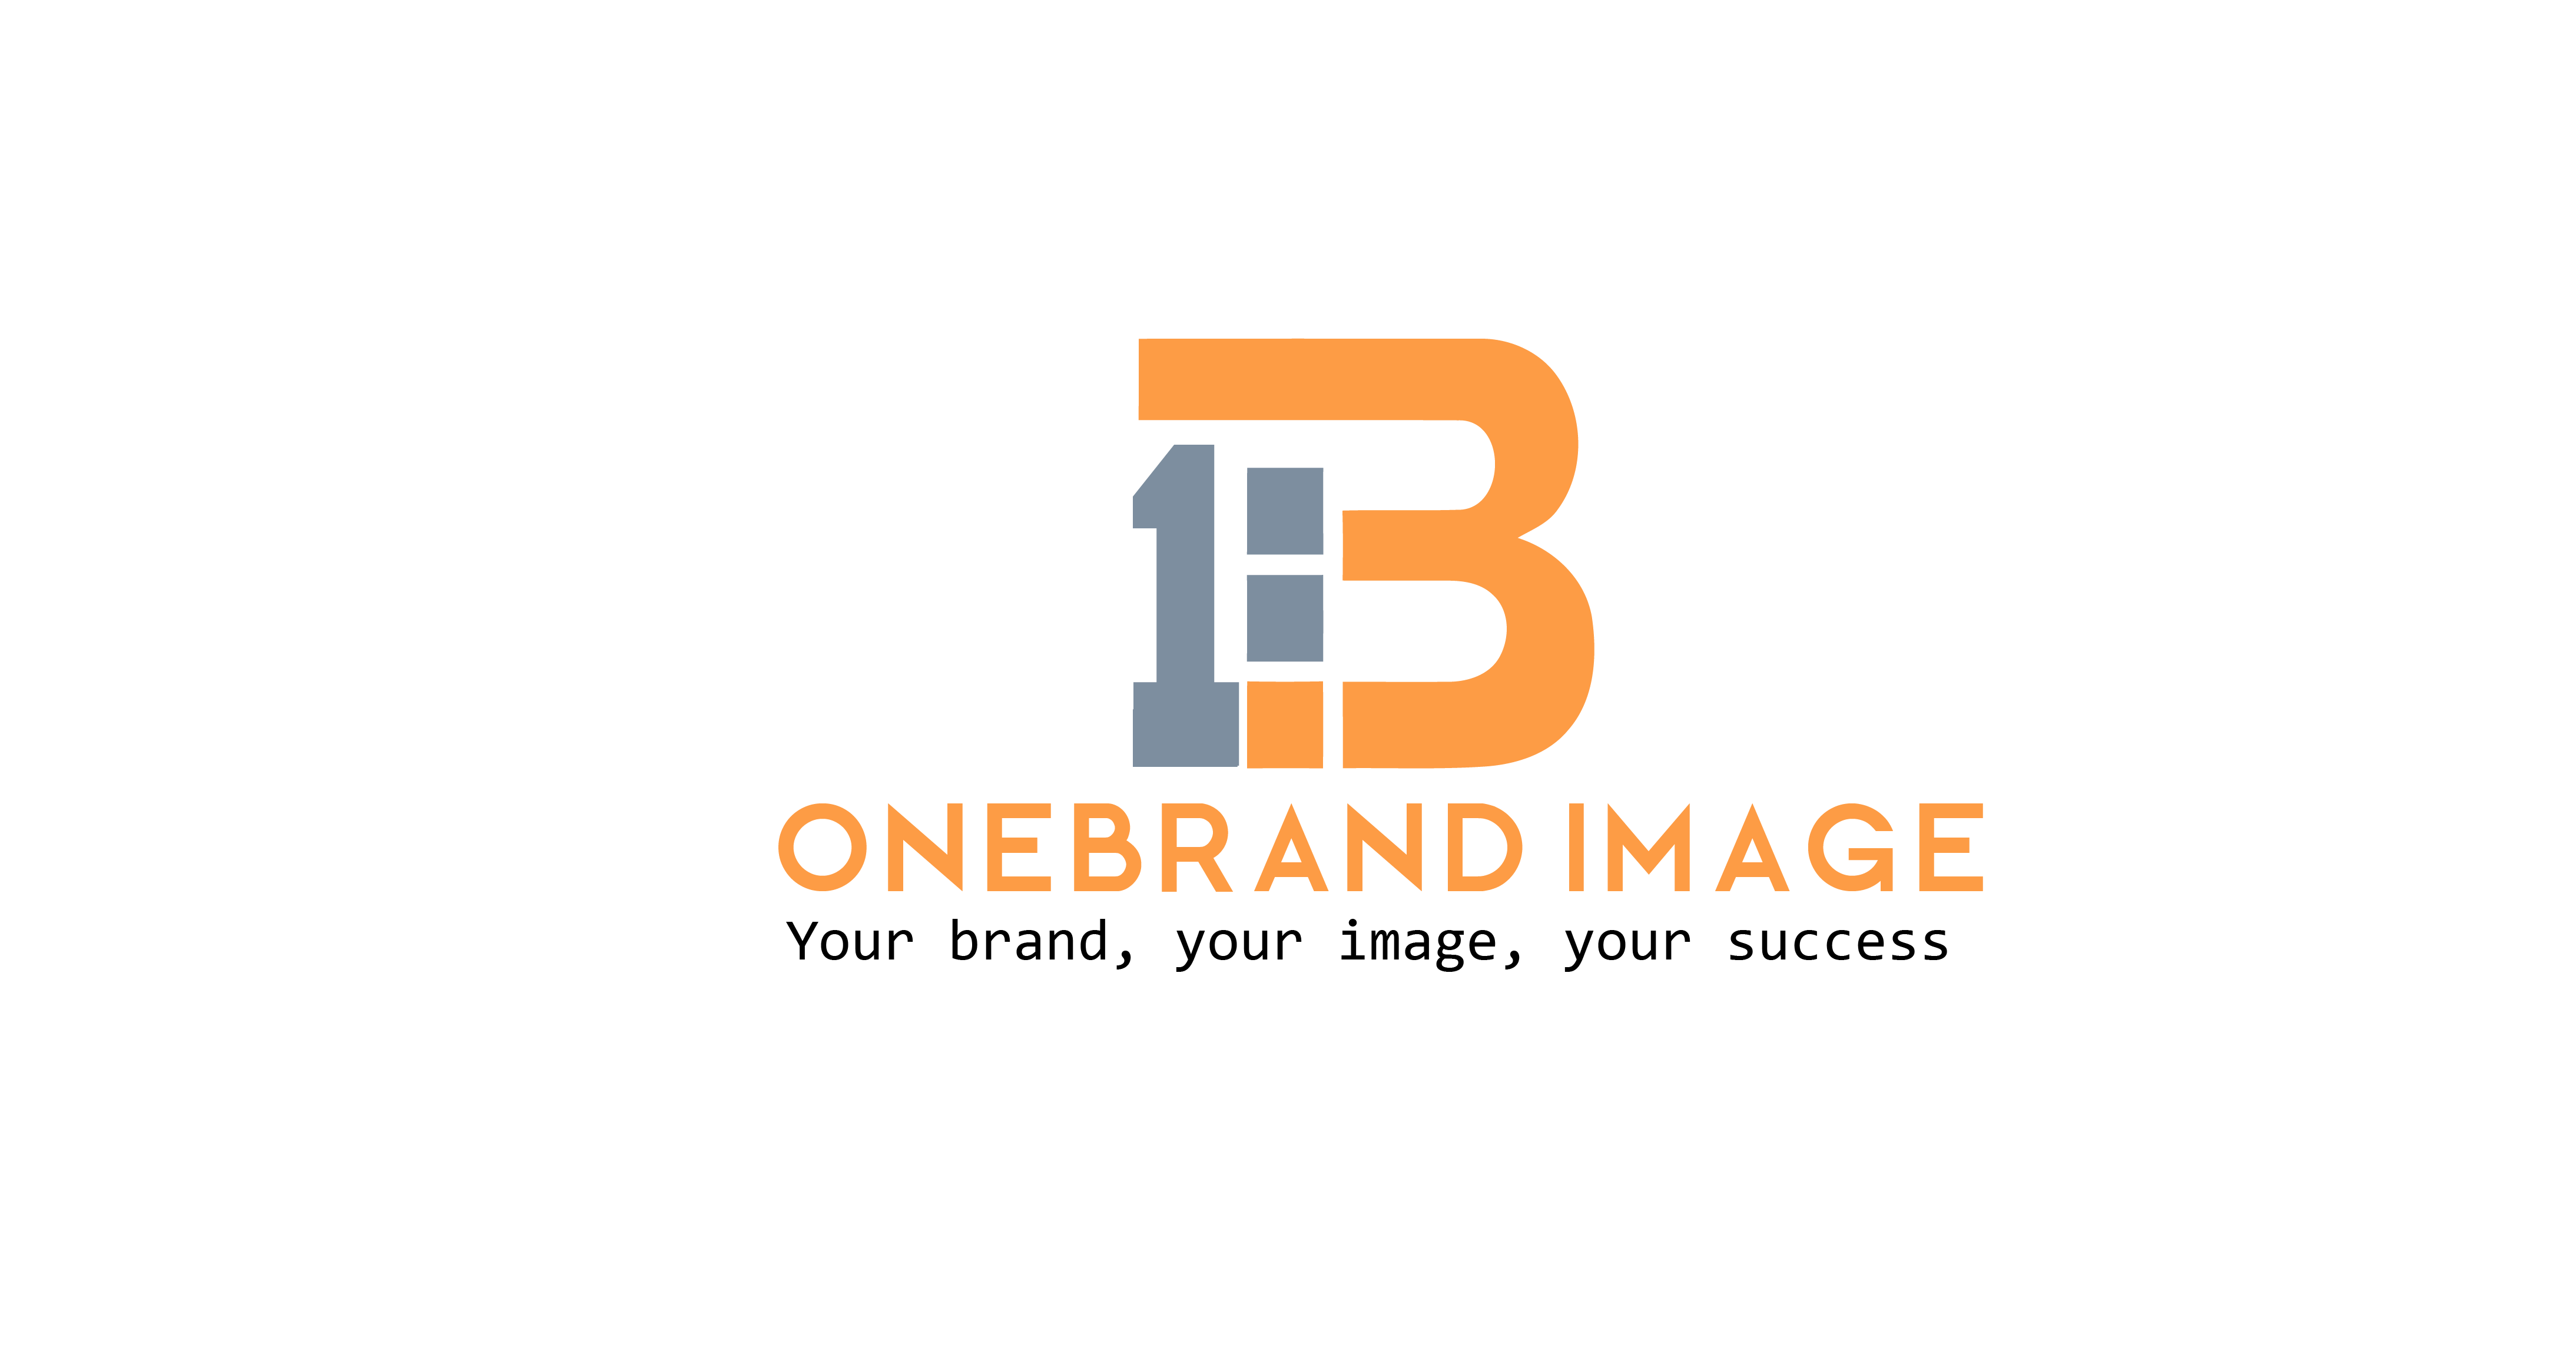 OneBrand Image, LLC